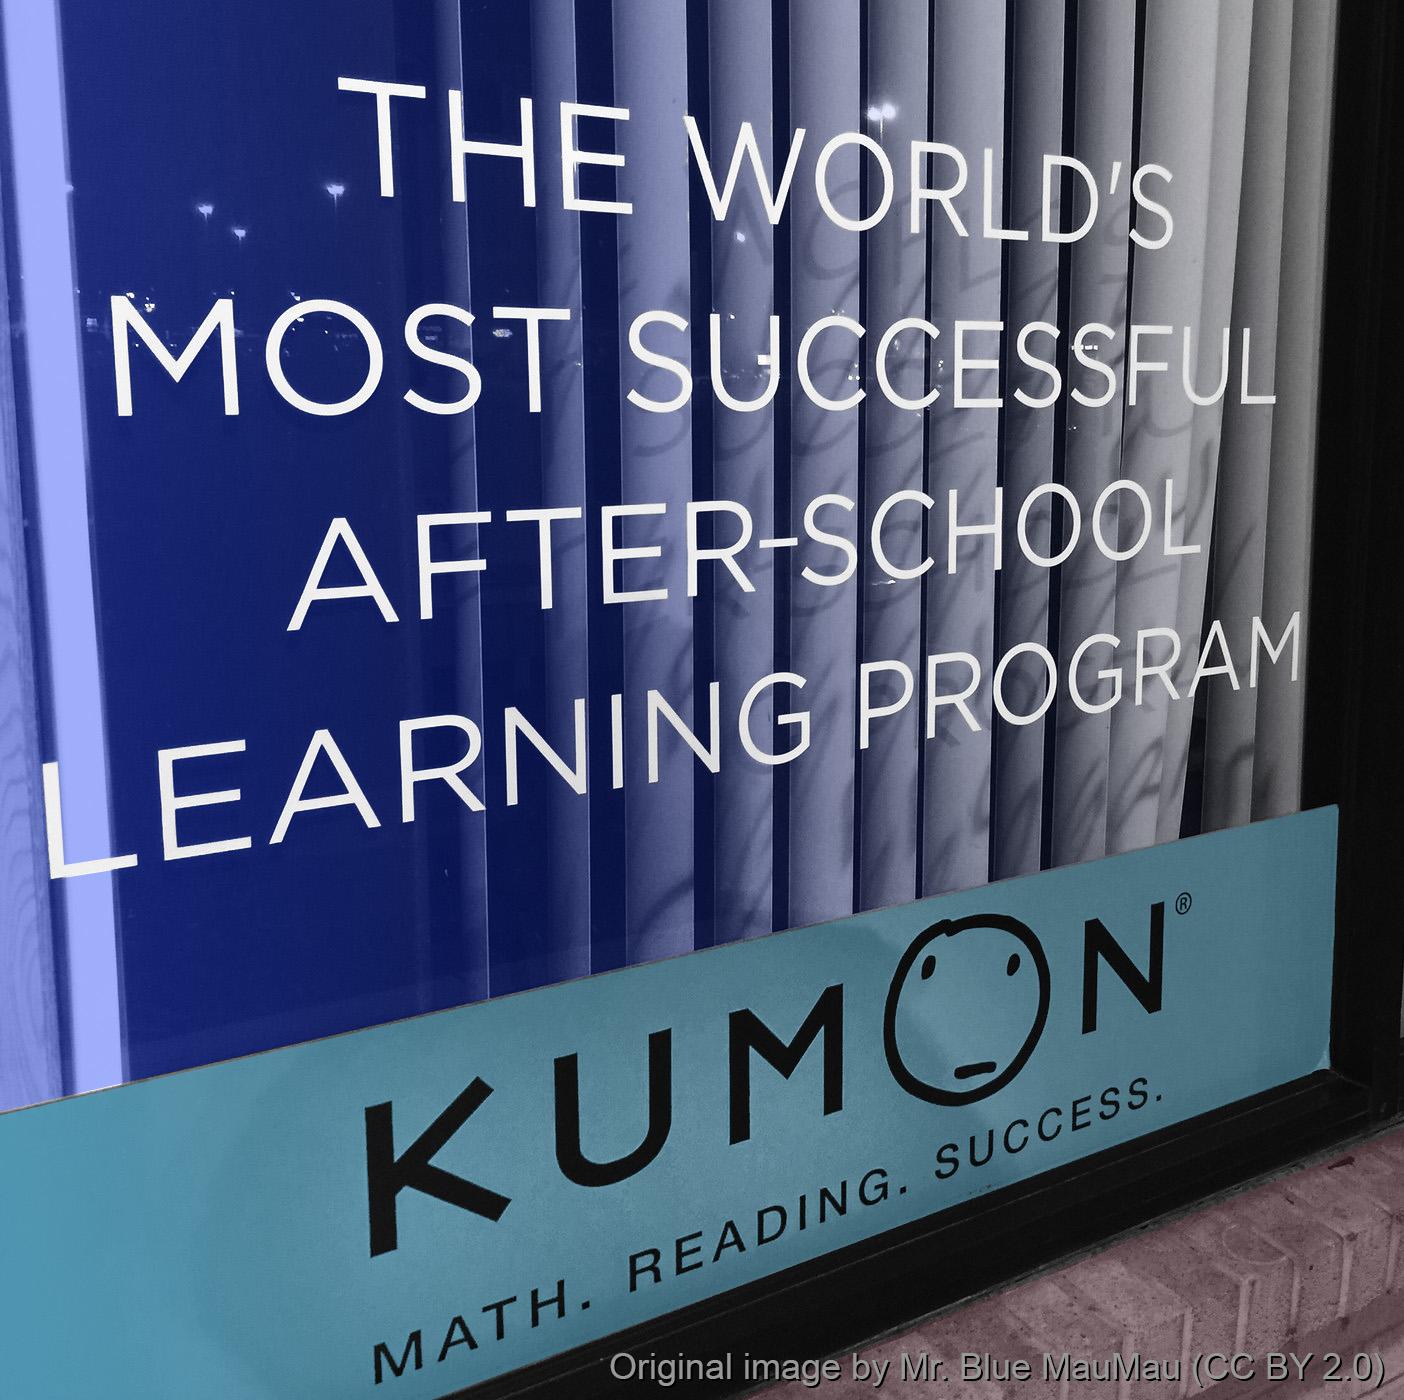 Kumon Math Amp Reading Centers Franchise Franchisebiz Review